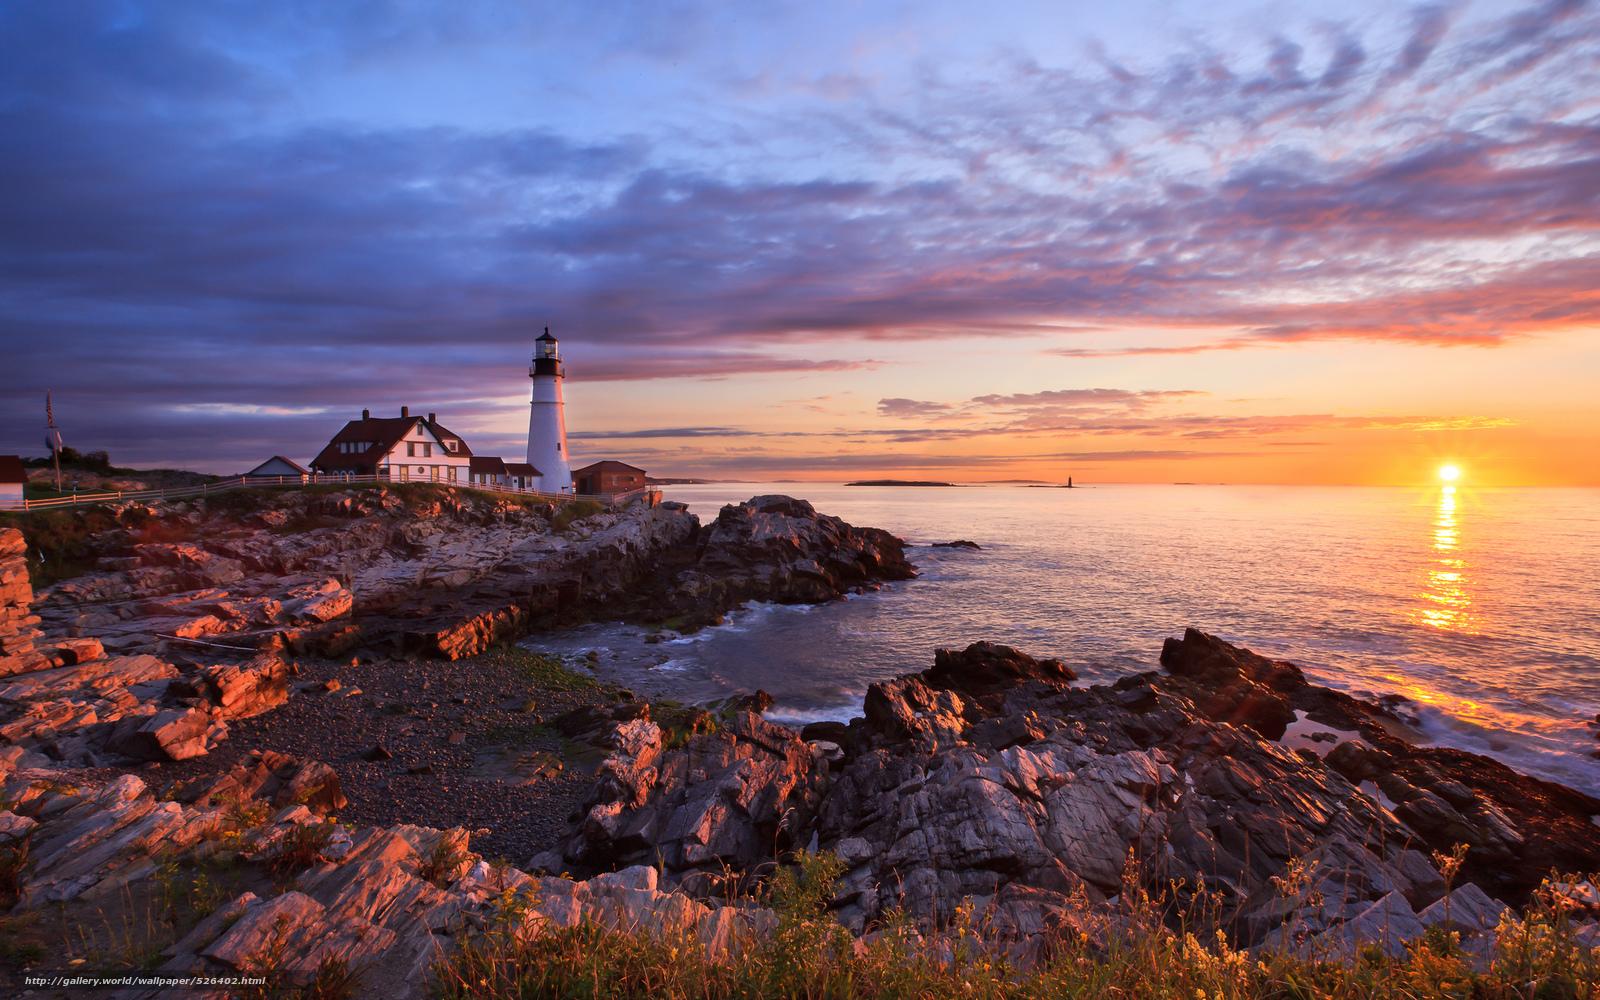 Download Wallpaper Portland Rocks Lighthouse Sea Free